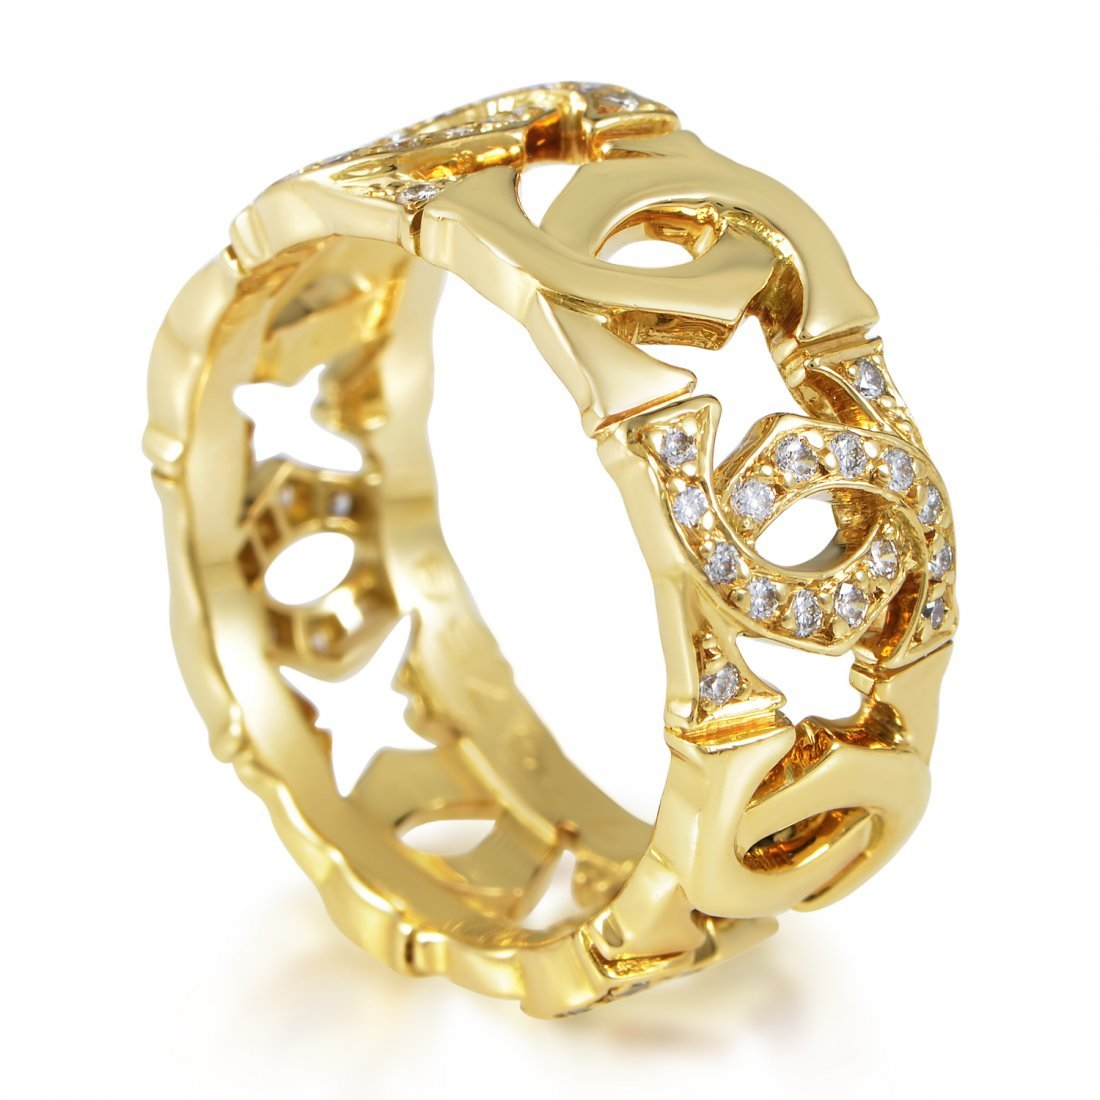 Cartier C de Cartier 18K Yellow Gold Diamond Band Ring